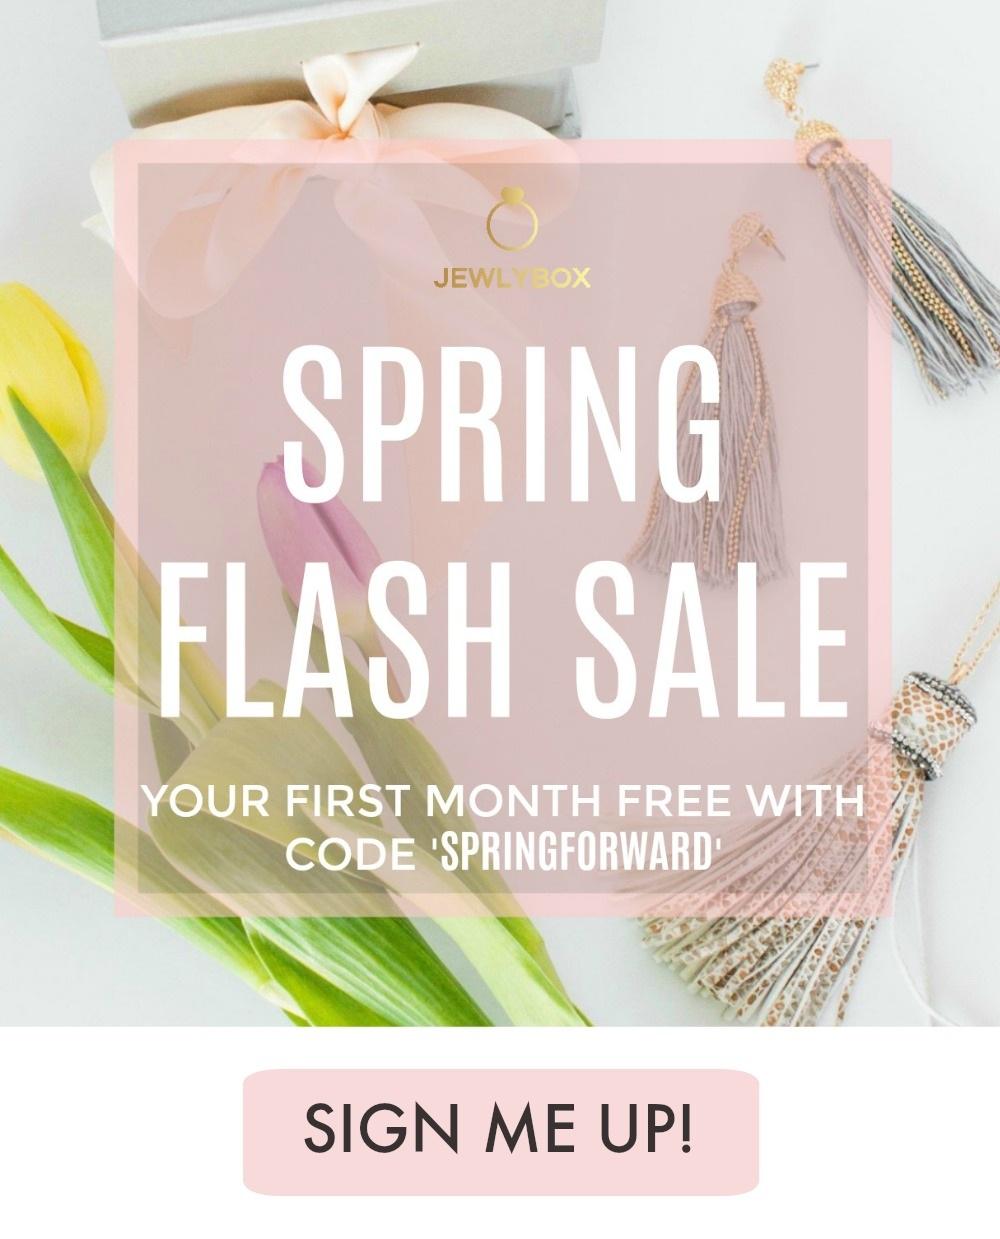 Springforward Promotion - Jewlybox 2019